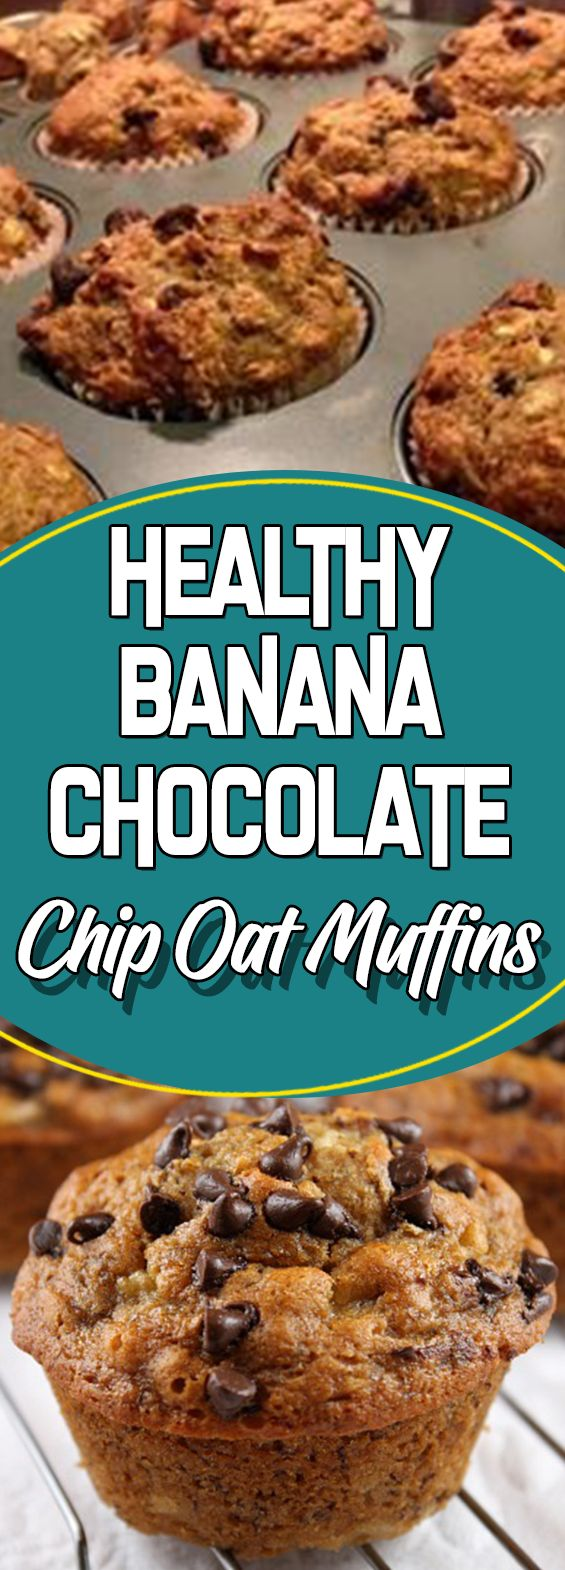 Healthy Banana Chocolate Chip Oat Muffins #dessert #dessertrecipes #recipeideas #homemade #desserttable #appetizer